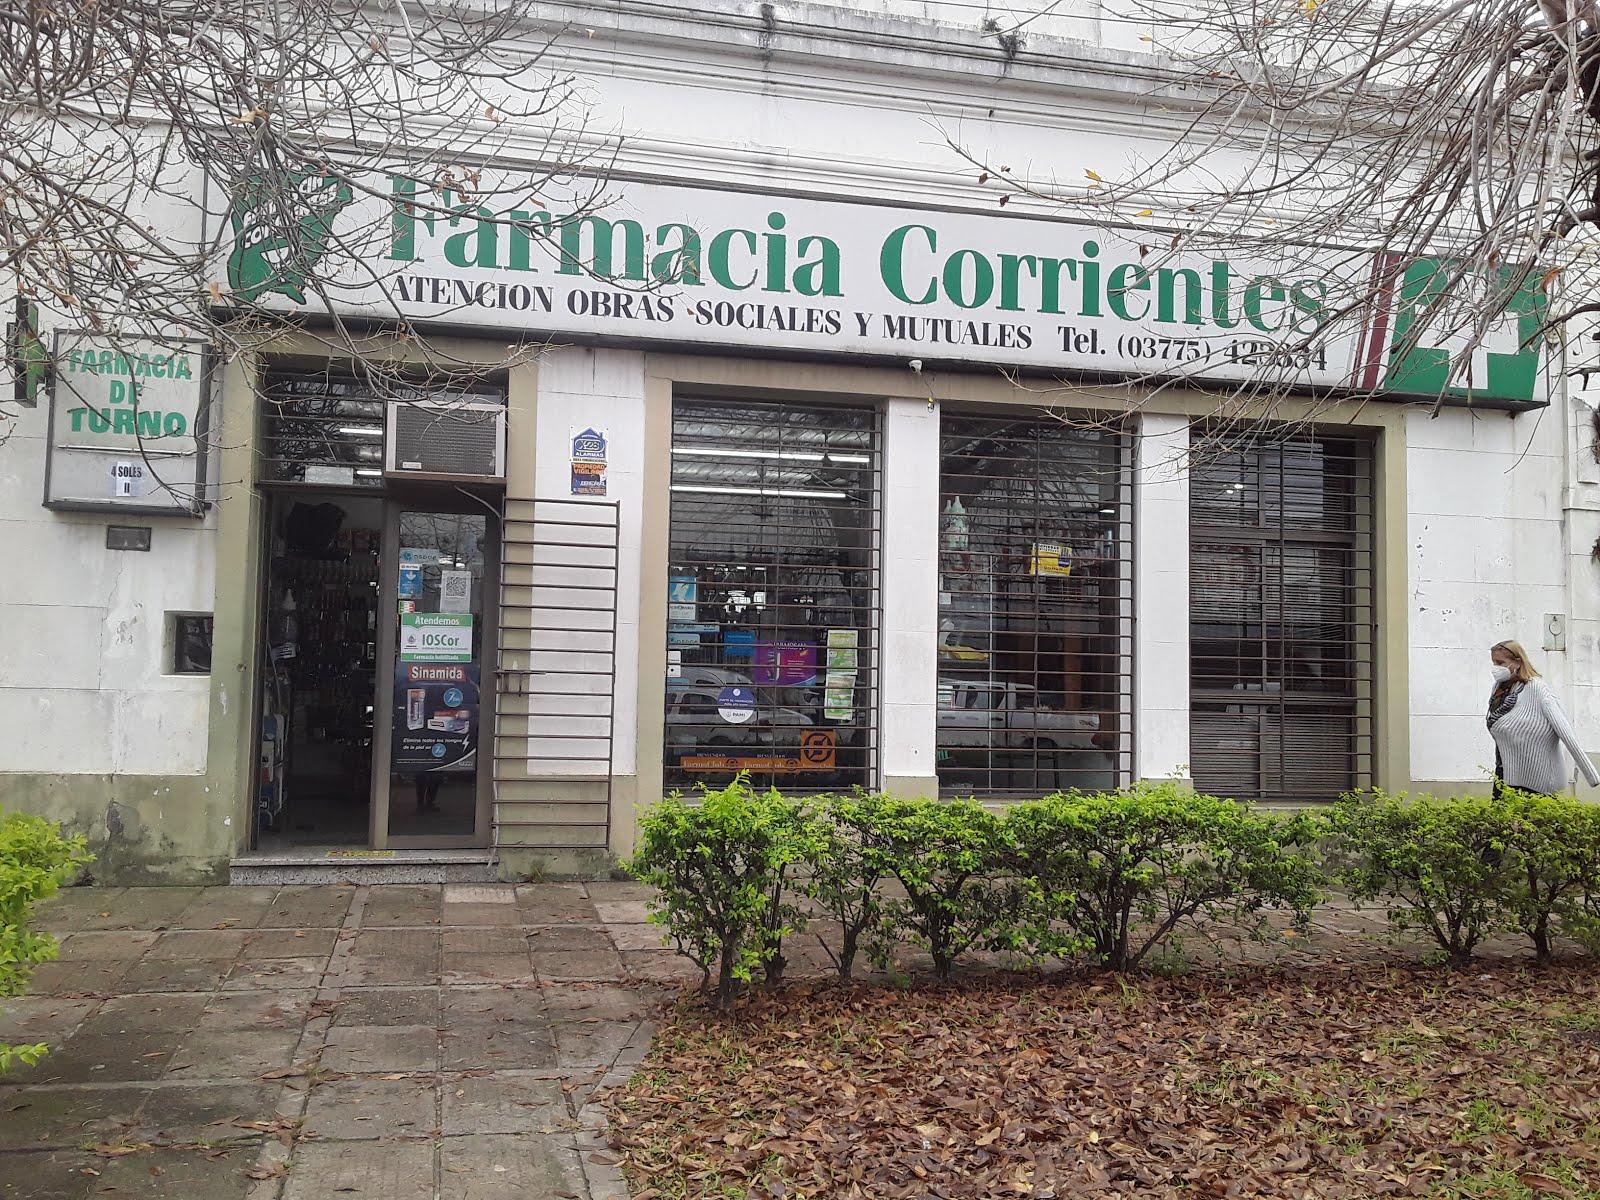 FARMACIA CORRIENTES